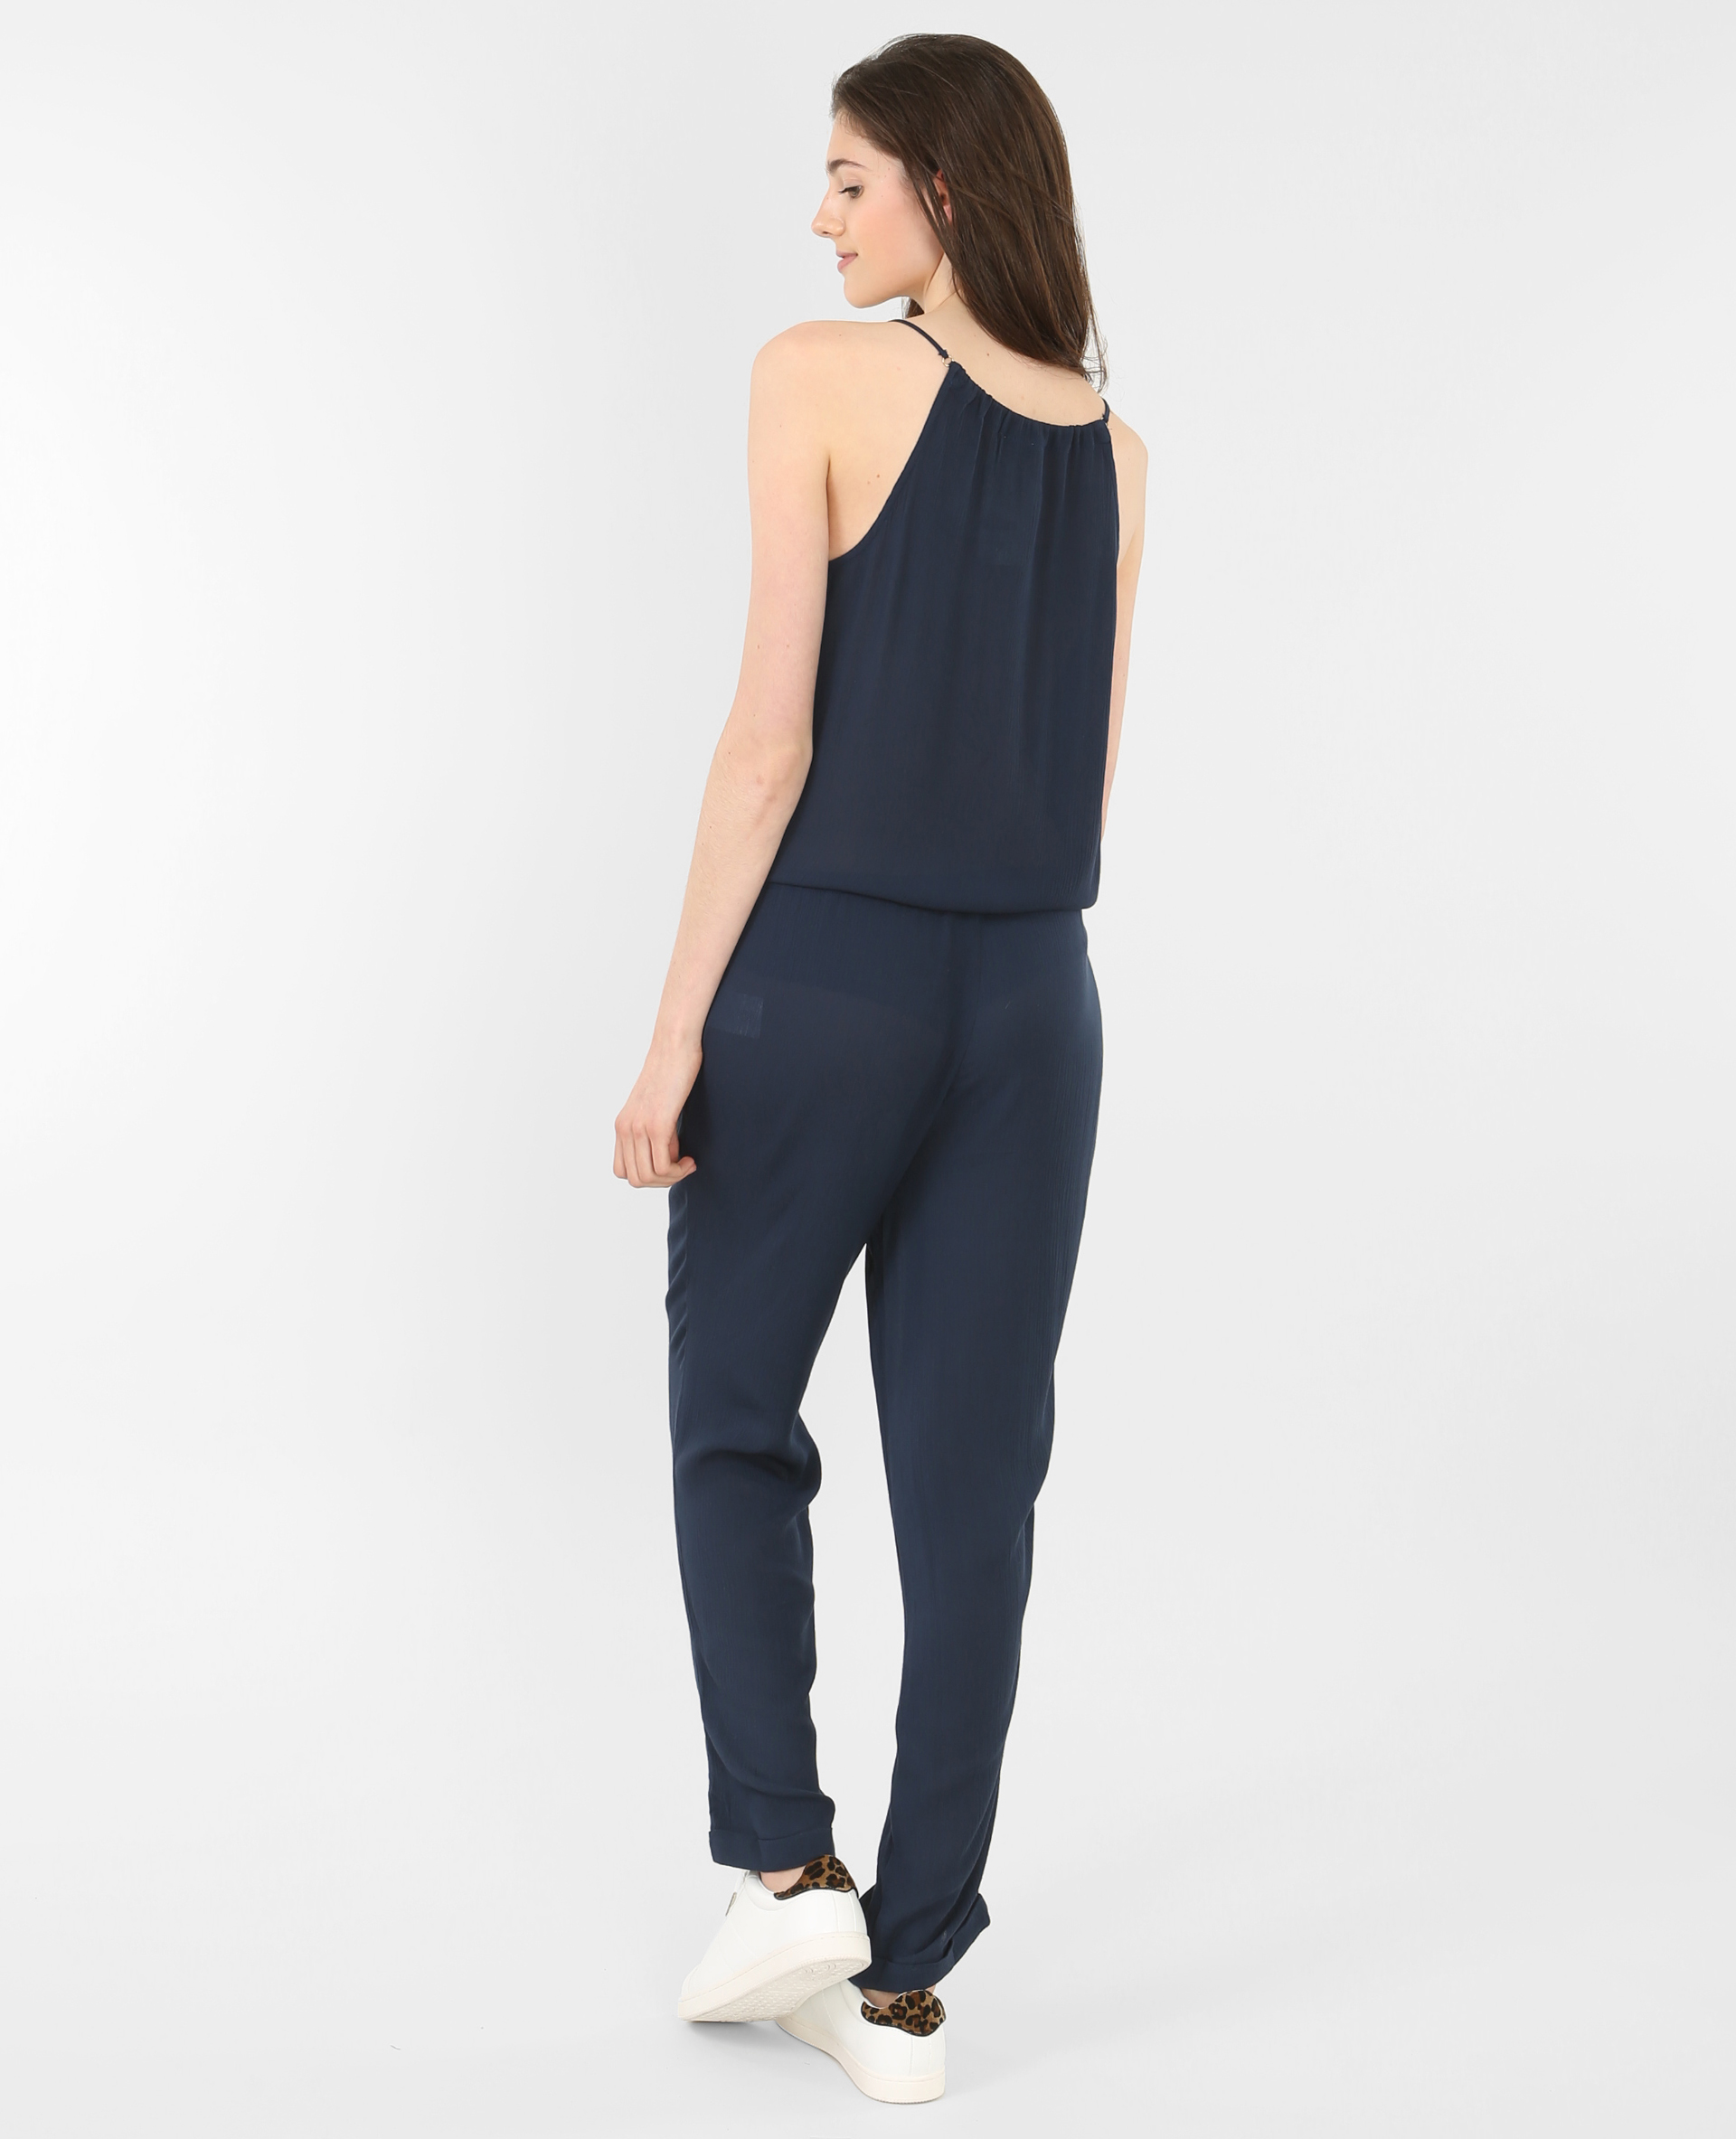 Combi pantalon fluide bleu marine 151105635a06 pimkie - Combi pantalon bleu marine ...